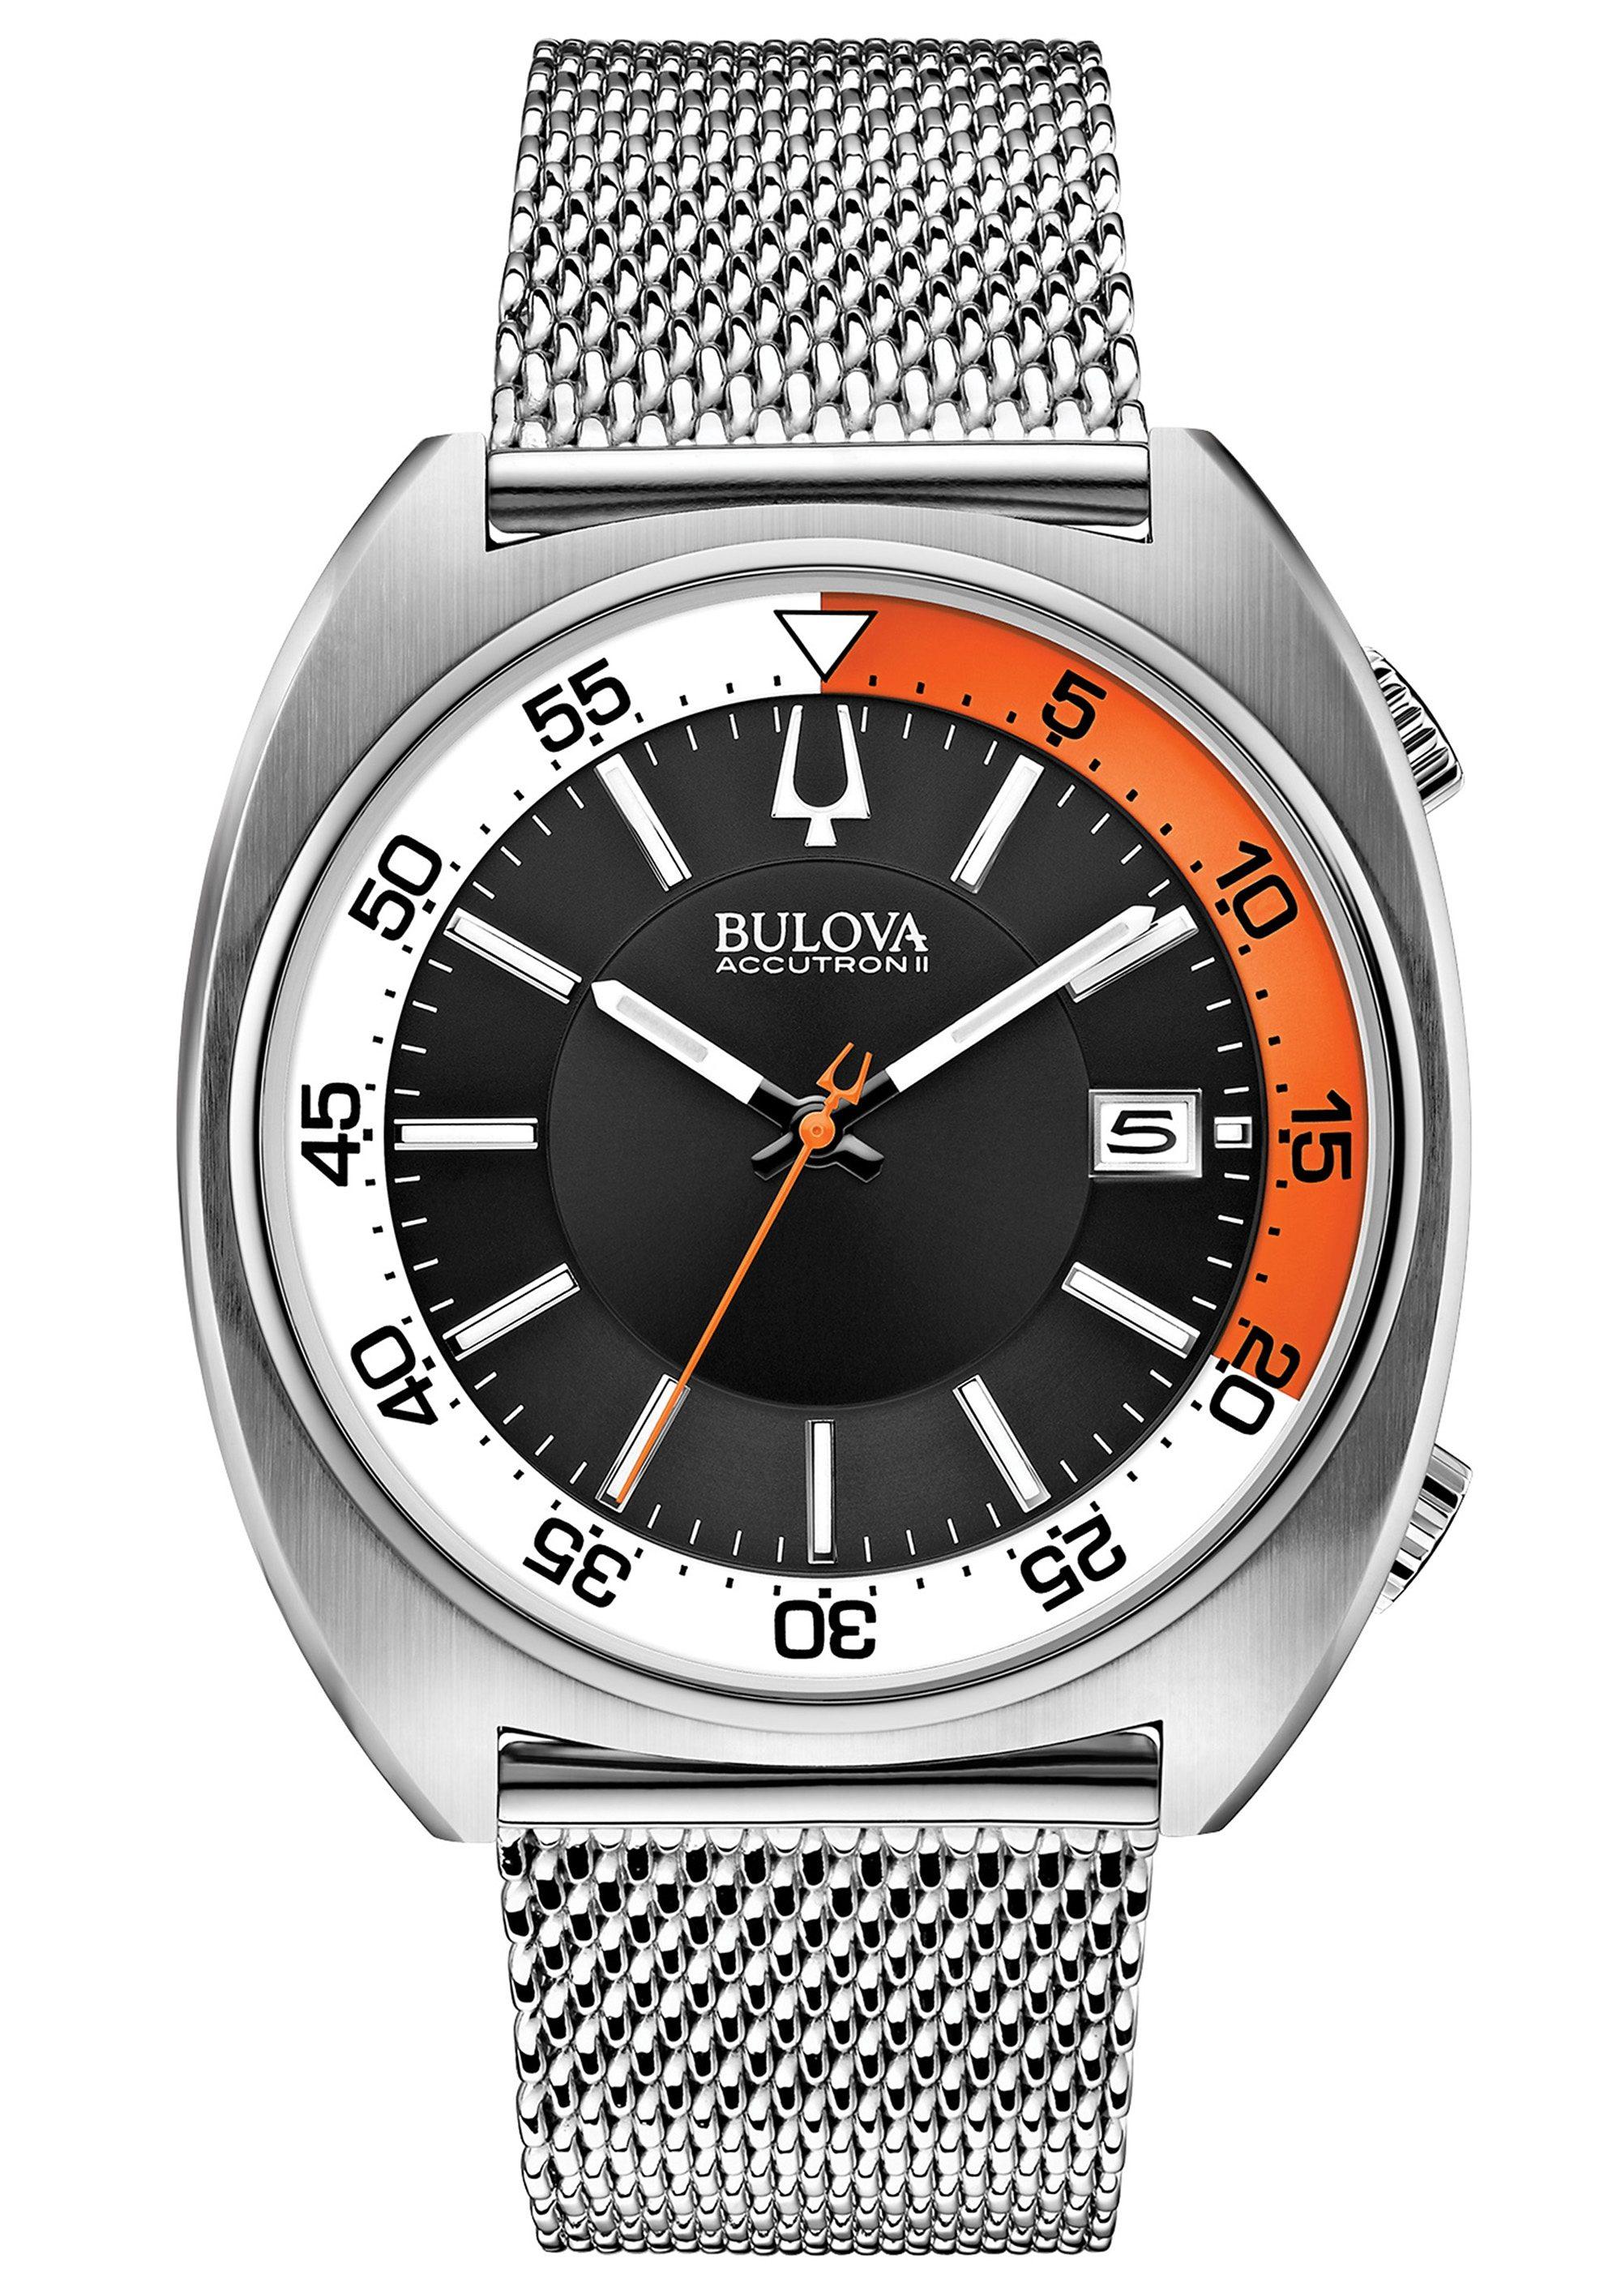 Bulova Quarzuhr »Accutron II Snorkel, 96B208«